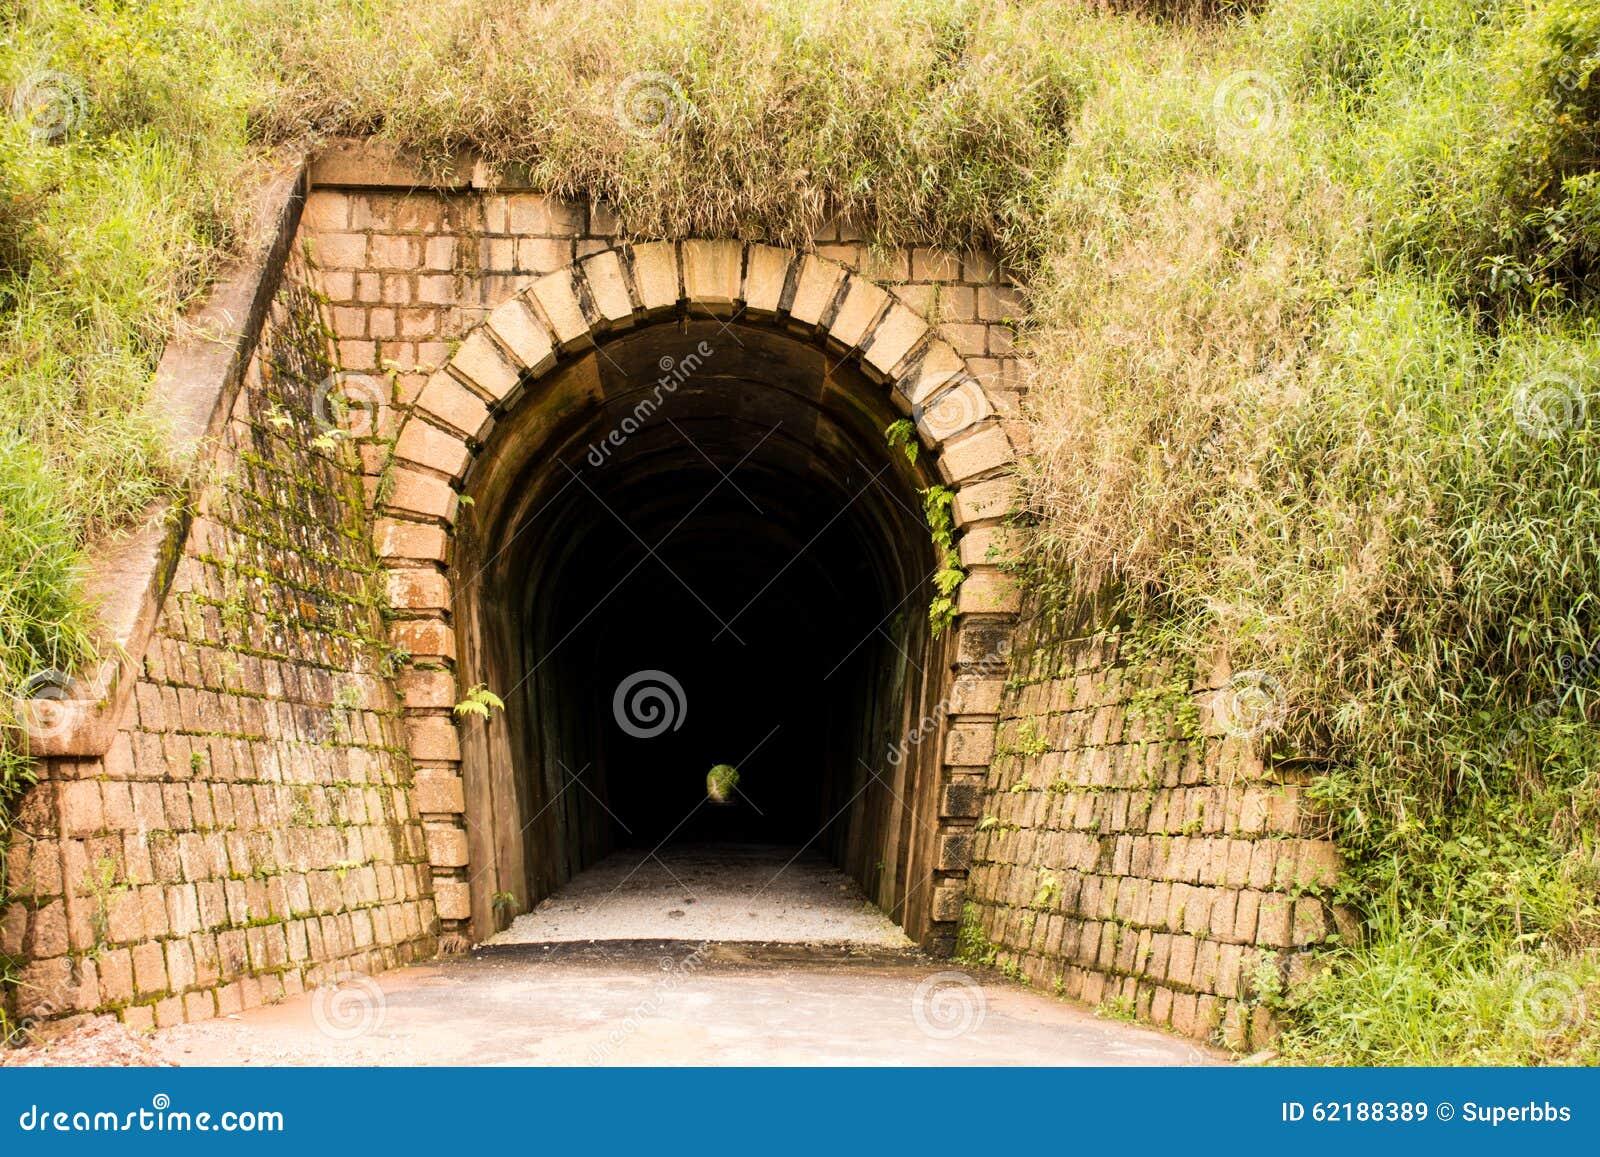 Túnel Mont Serrat - Ferrovia Brusque - Санта-Катарина, Бразилия